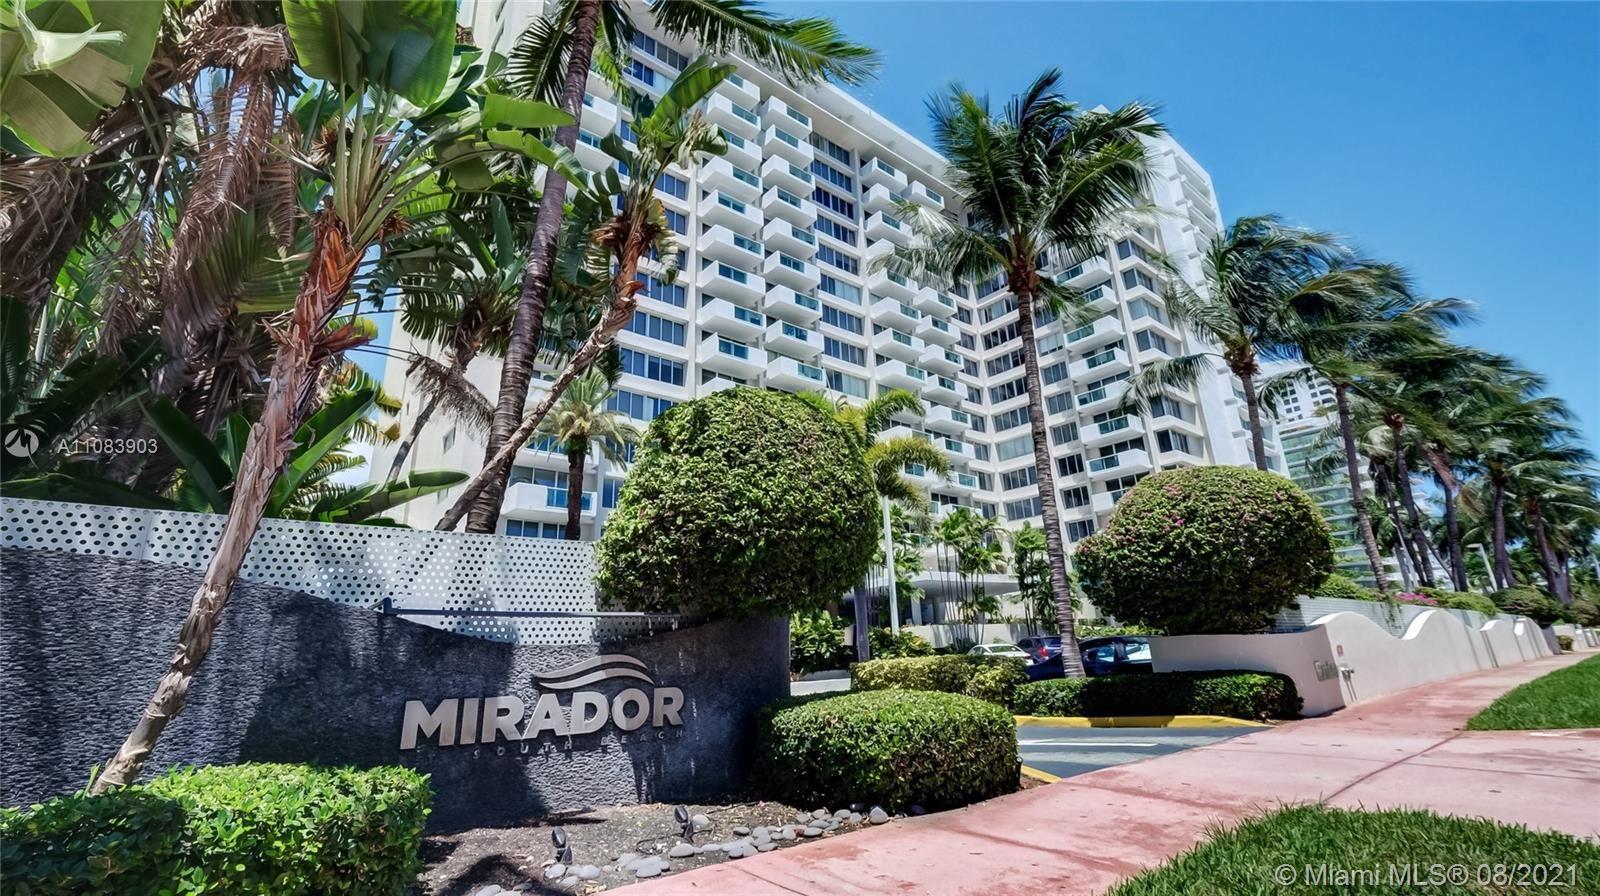 1200 West Ave #1210, Miami Beach, FL 33139 - #: A11083903